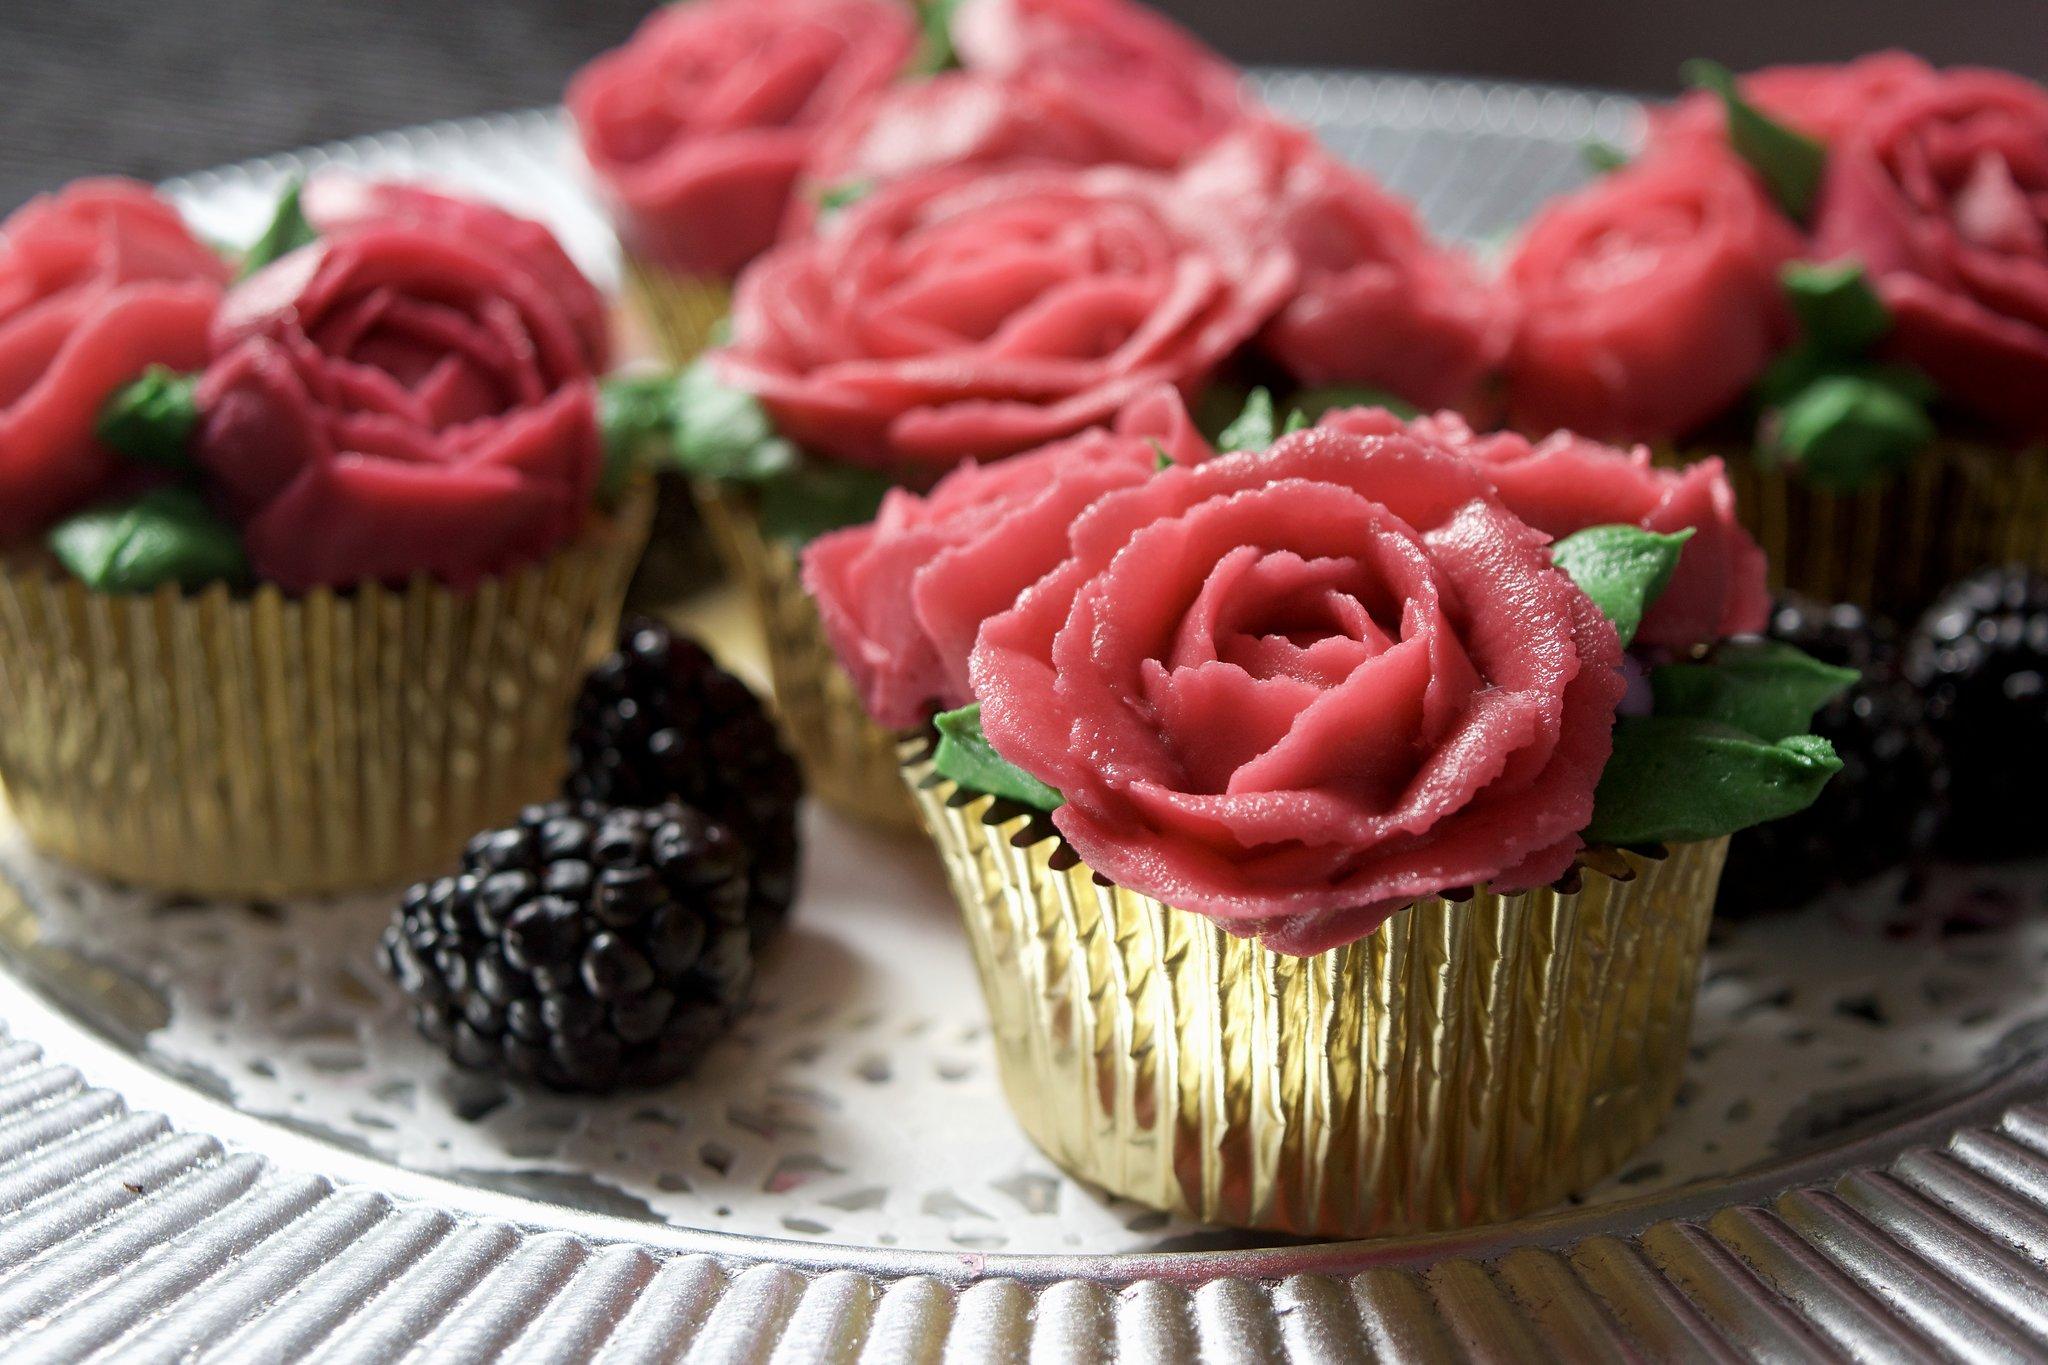 Cupcakes_03.jpg